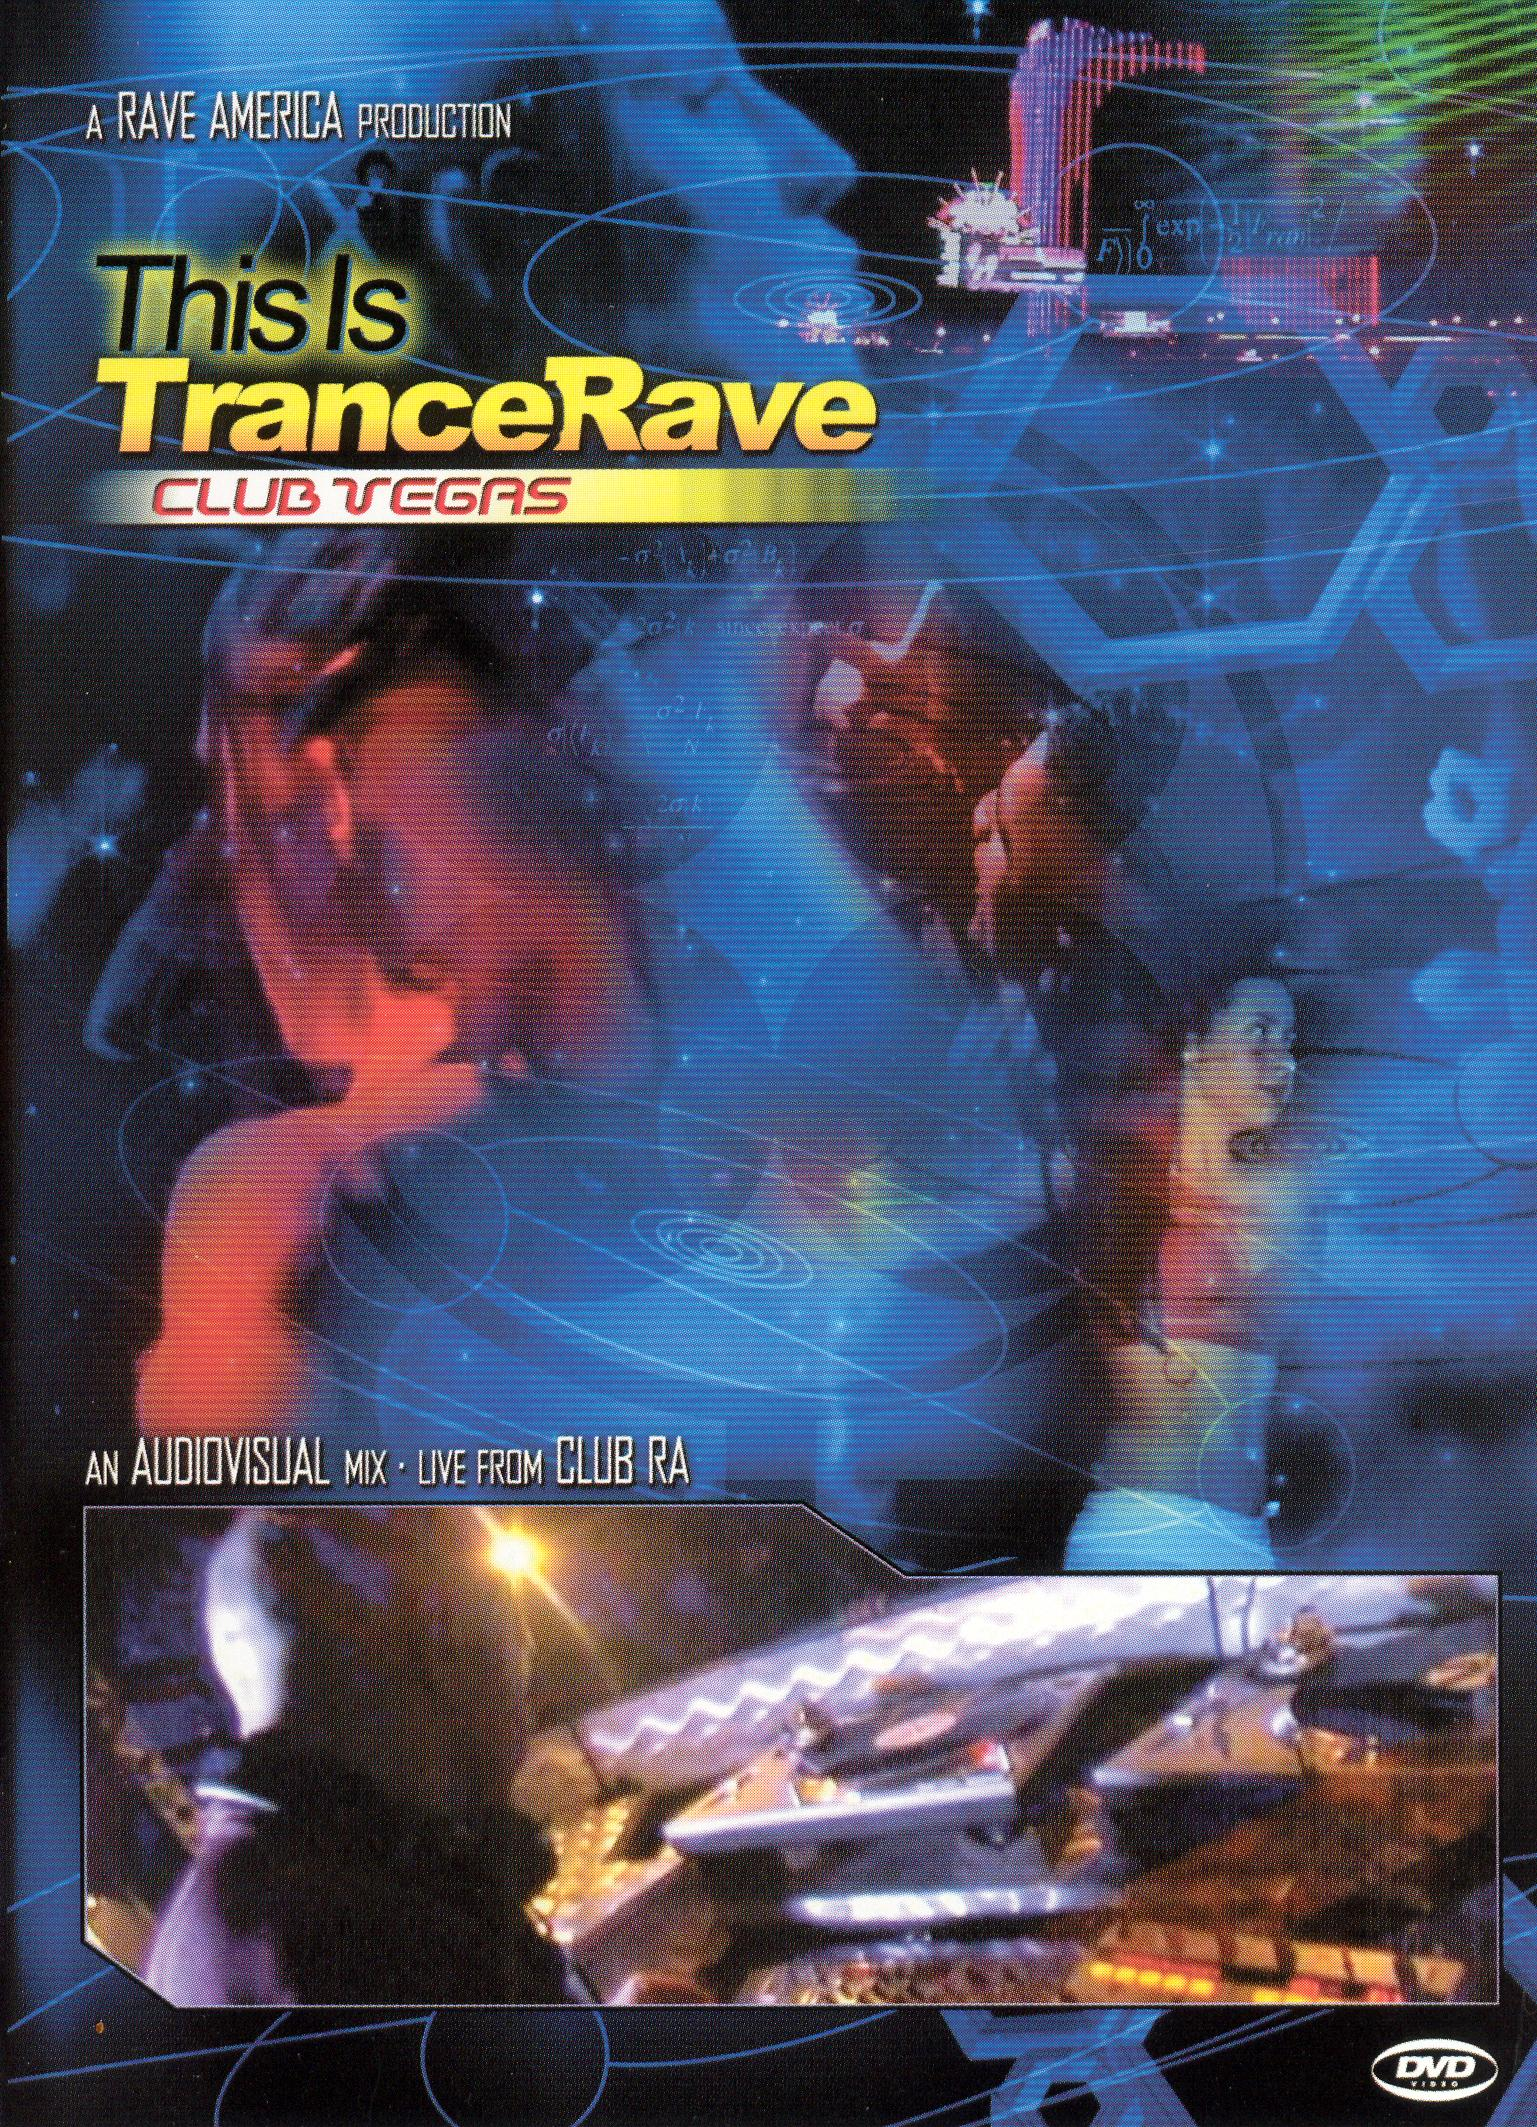 This Is Trance Rave: Club Vegas